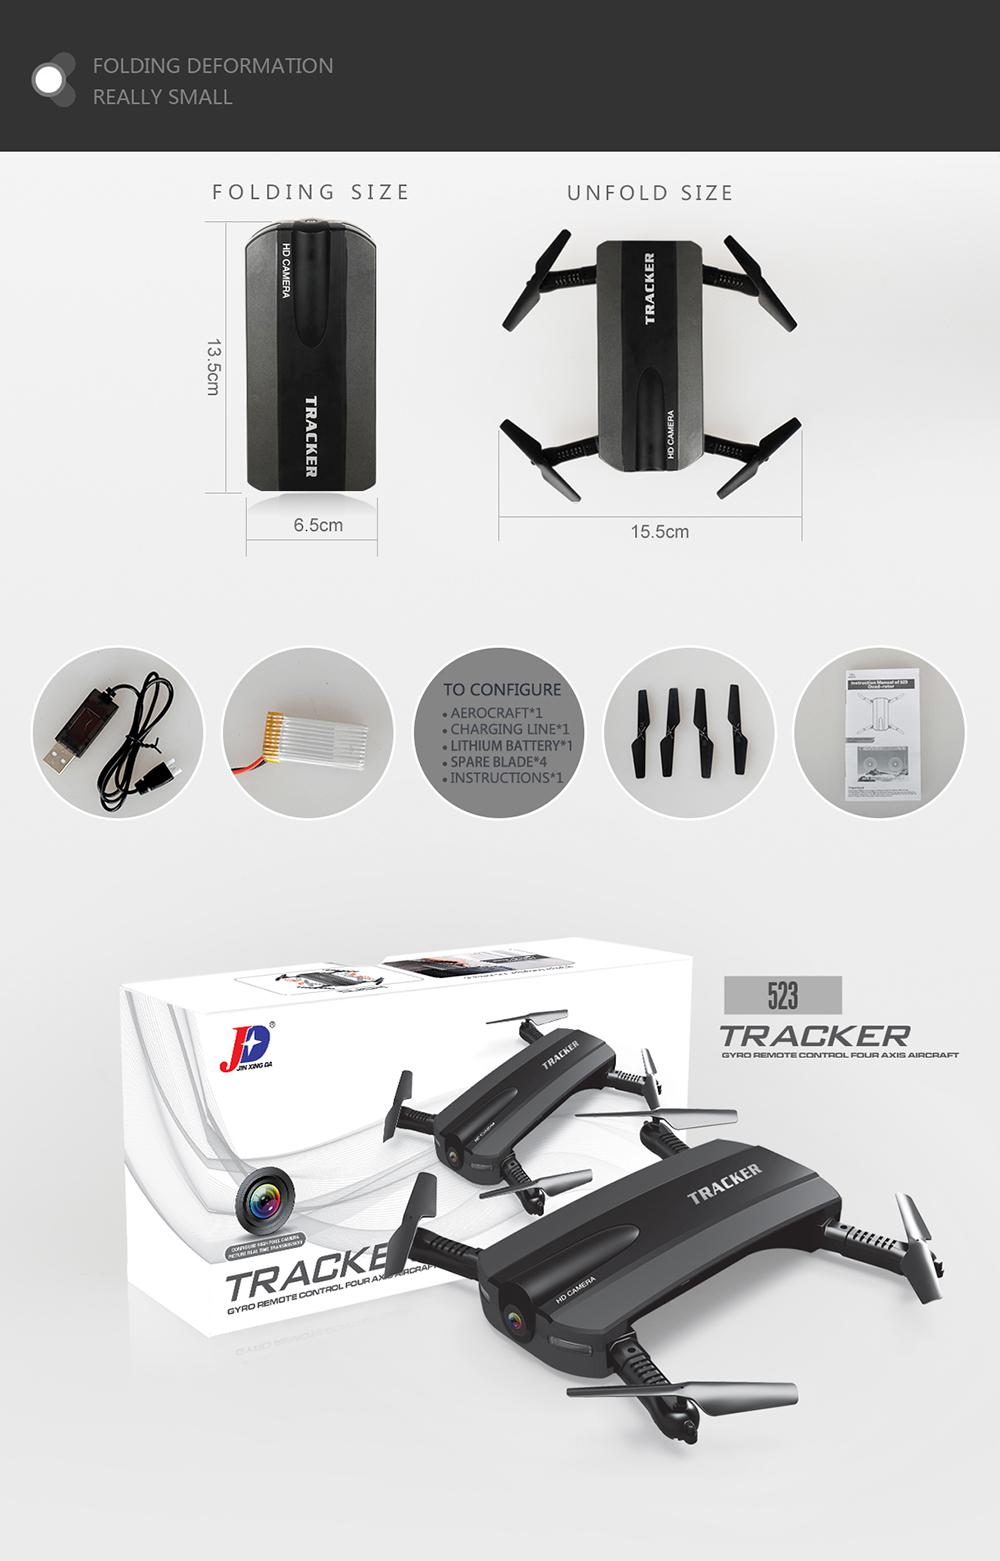 9 JXD 523 JXD523 Mini Foldable drone